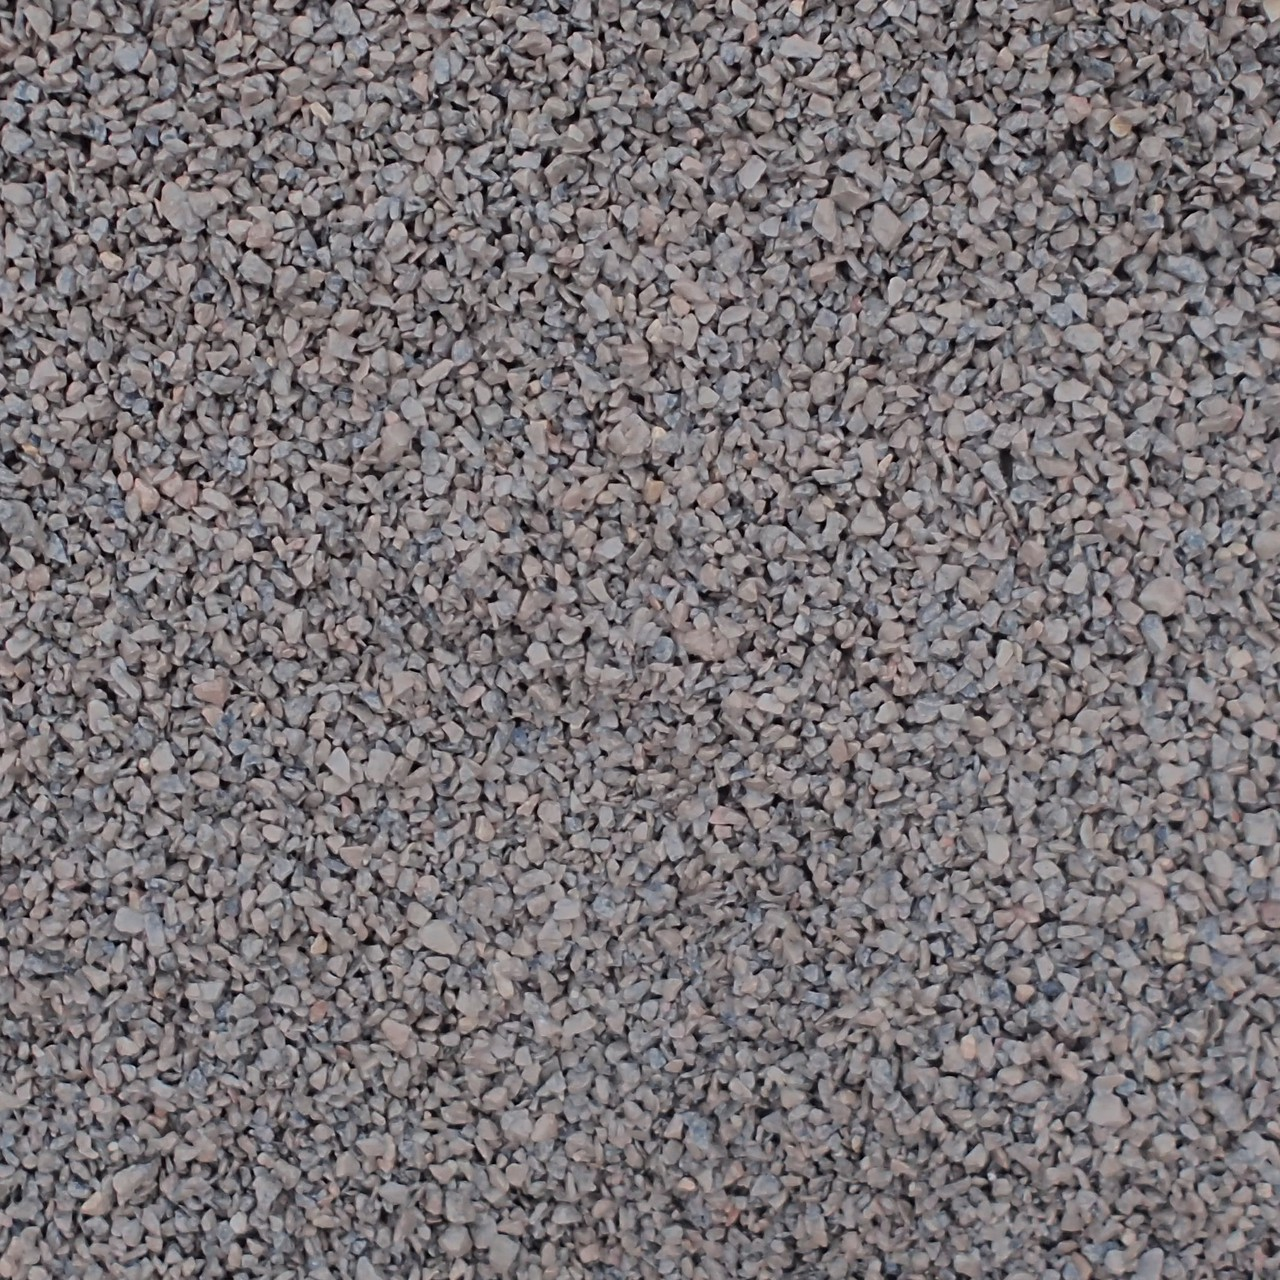 2-6mm Limestone Chippings